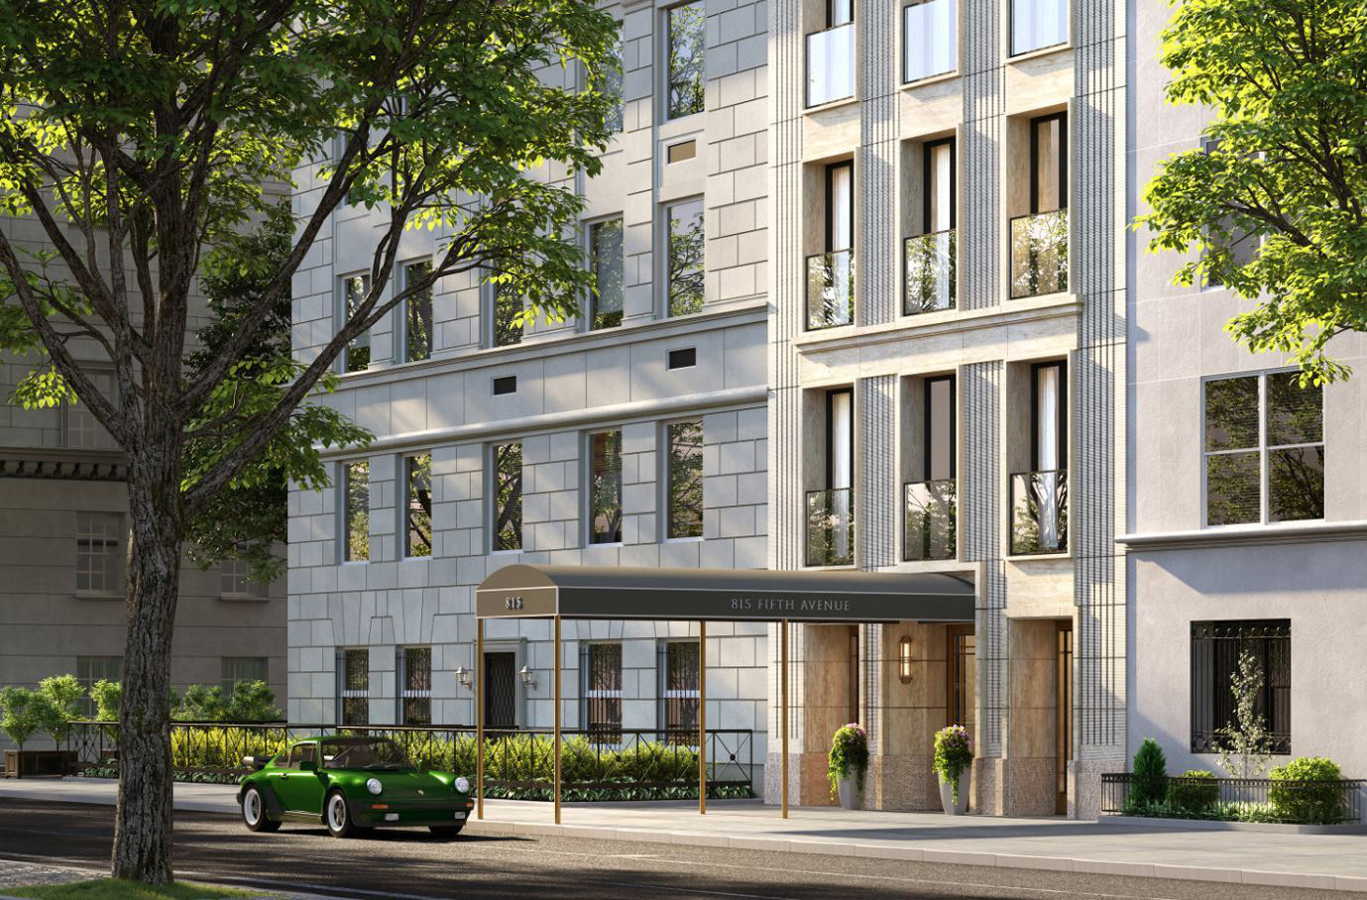 815 Fifth Avenue